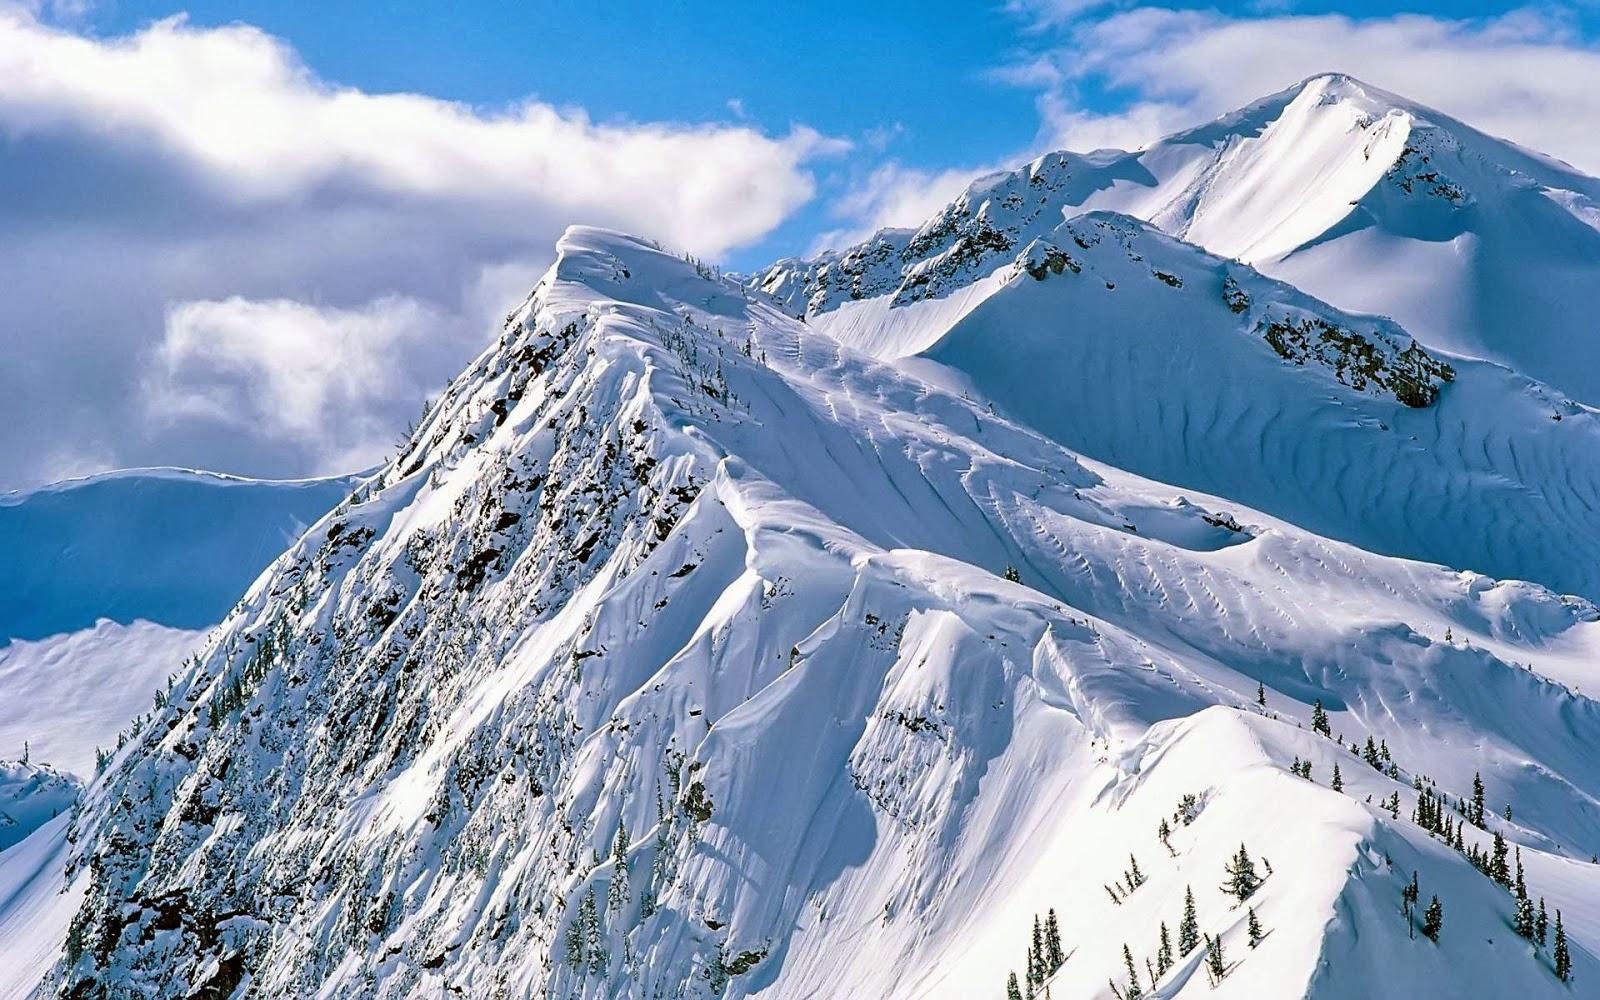 HD Wallpapers Desktop: Snowy Mountains HD Wallpapers